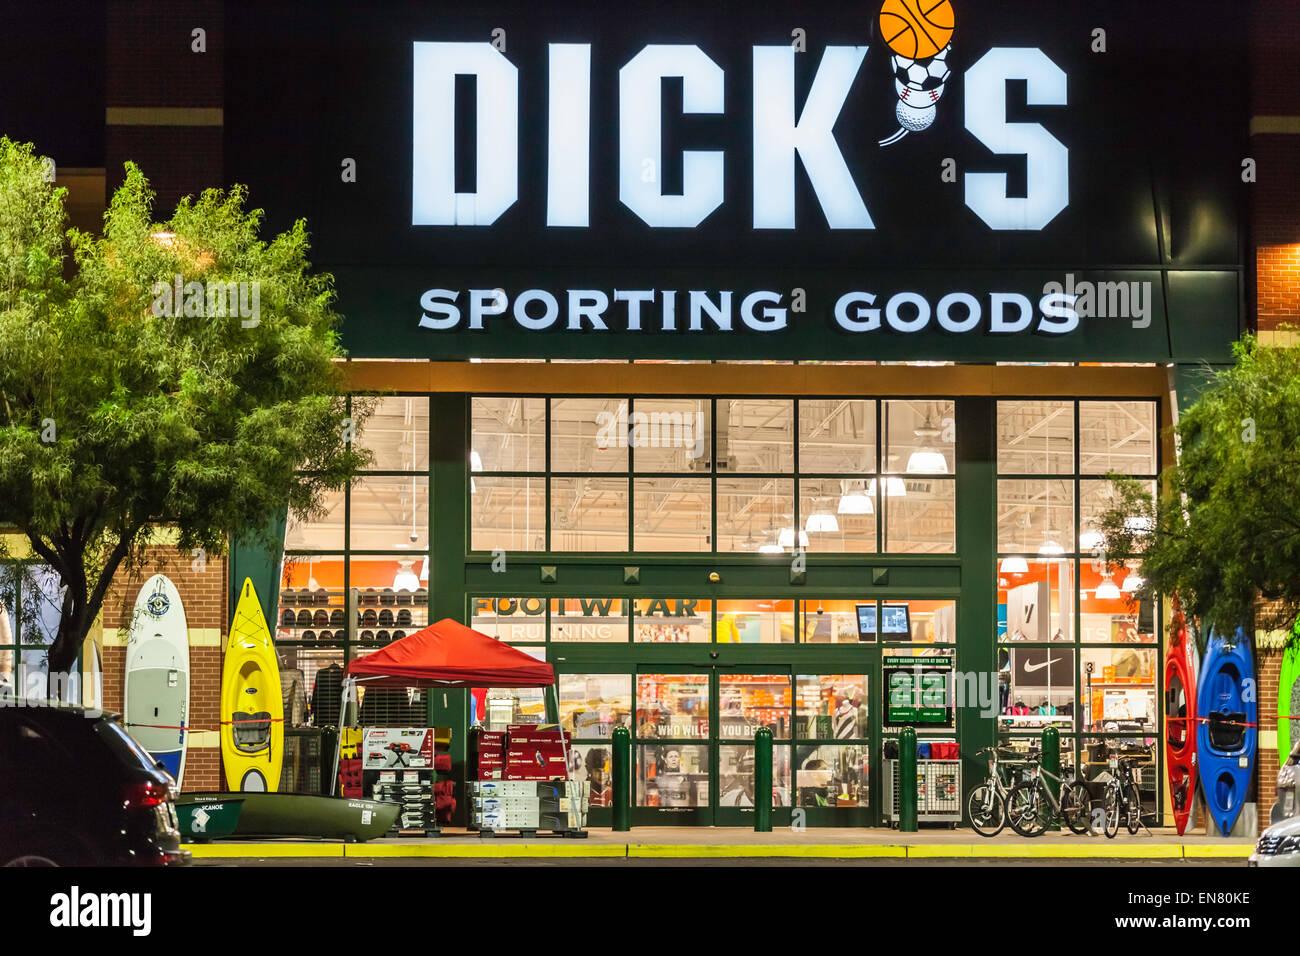 Dick's sporting goods in woodbury minnesota